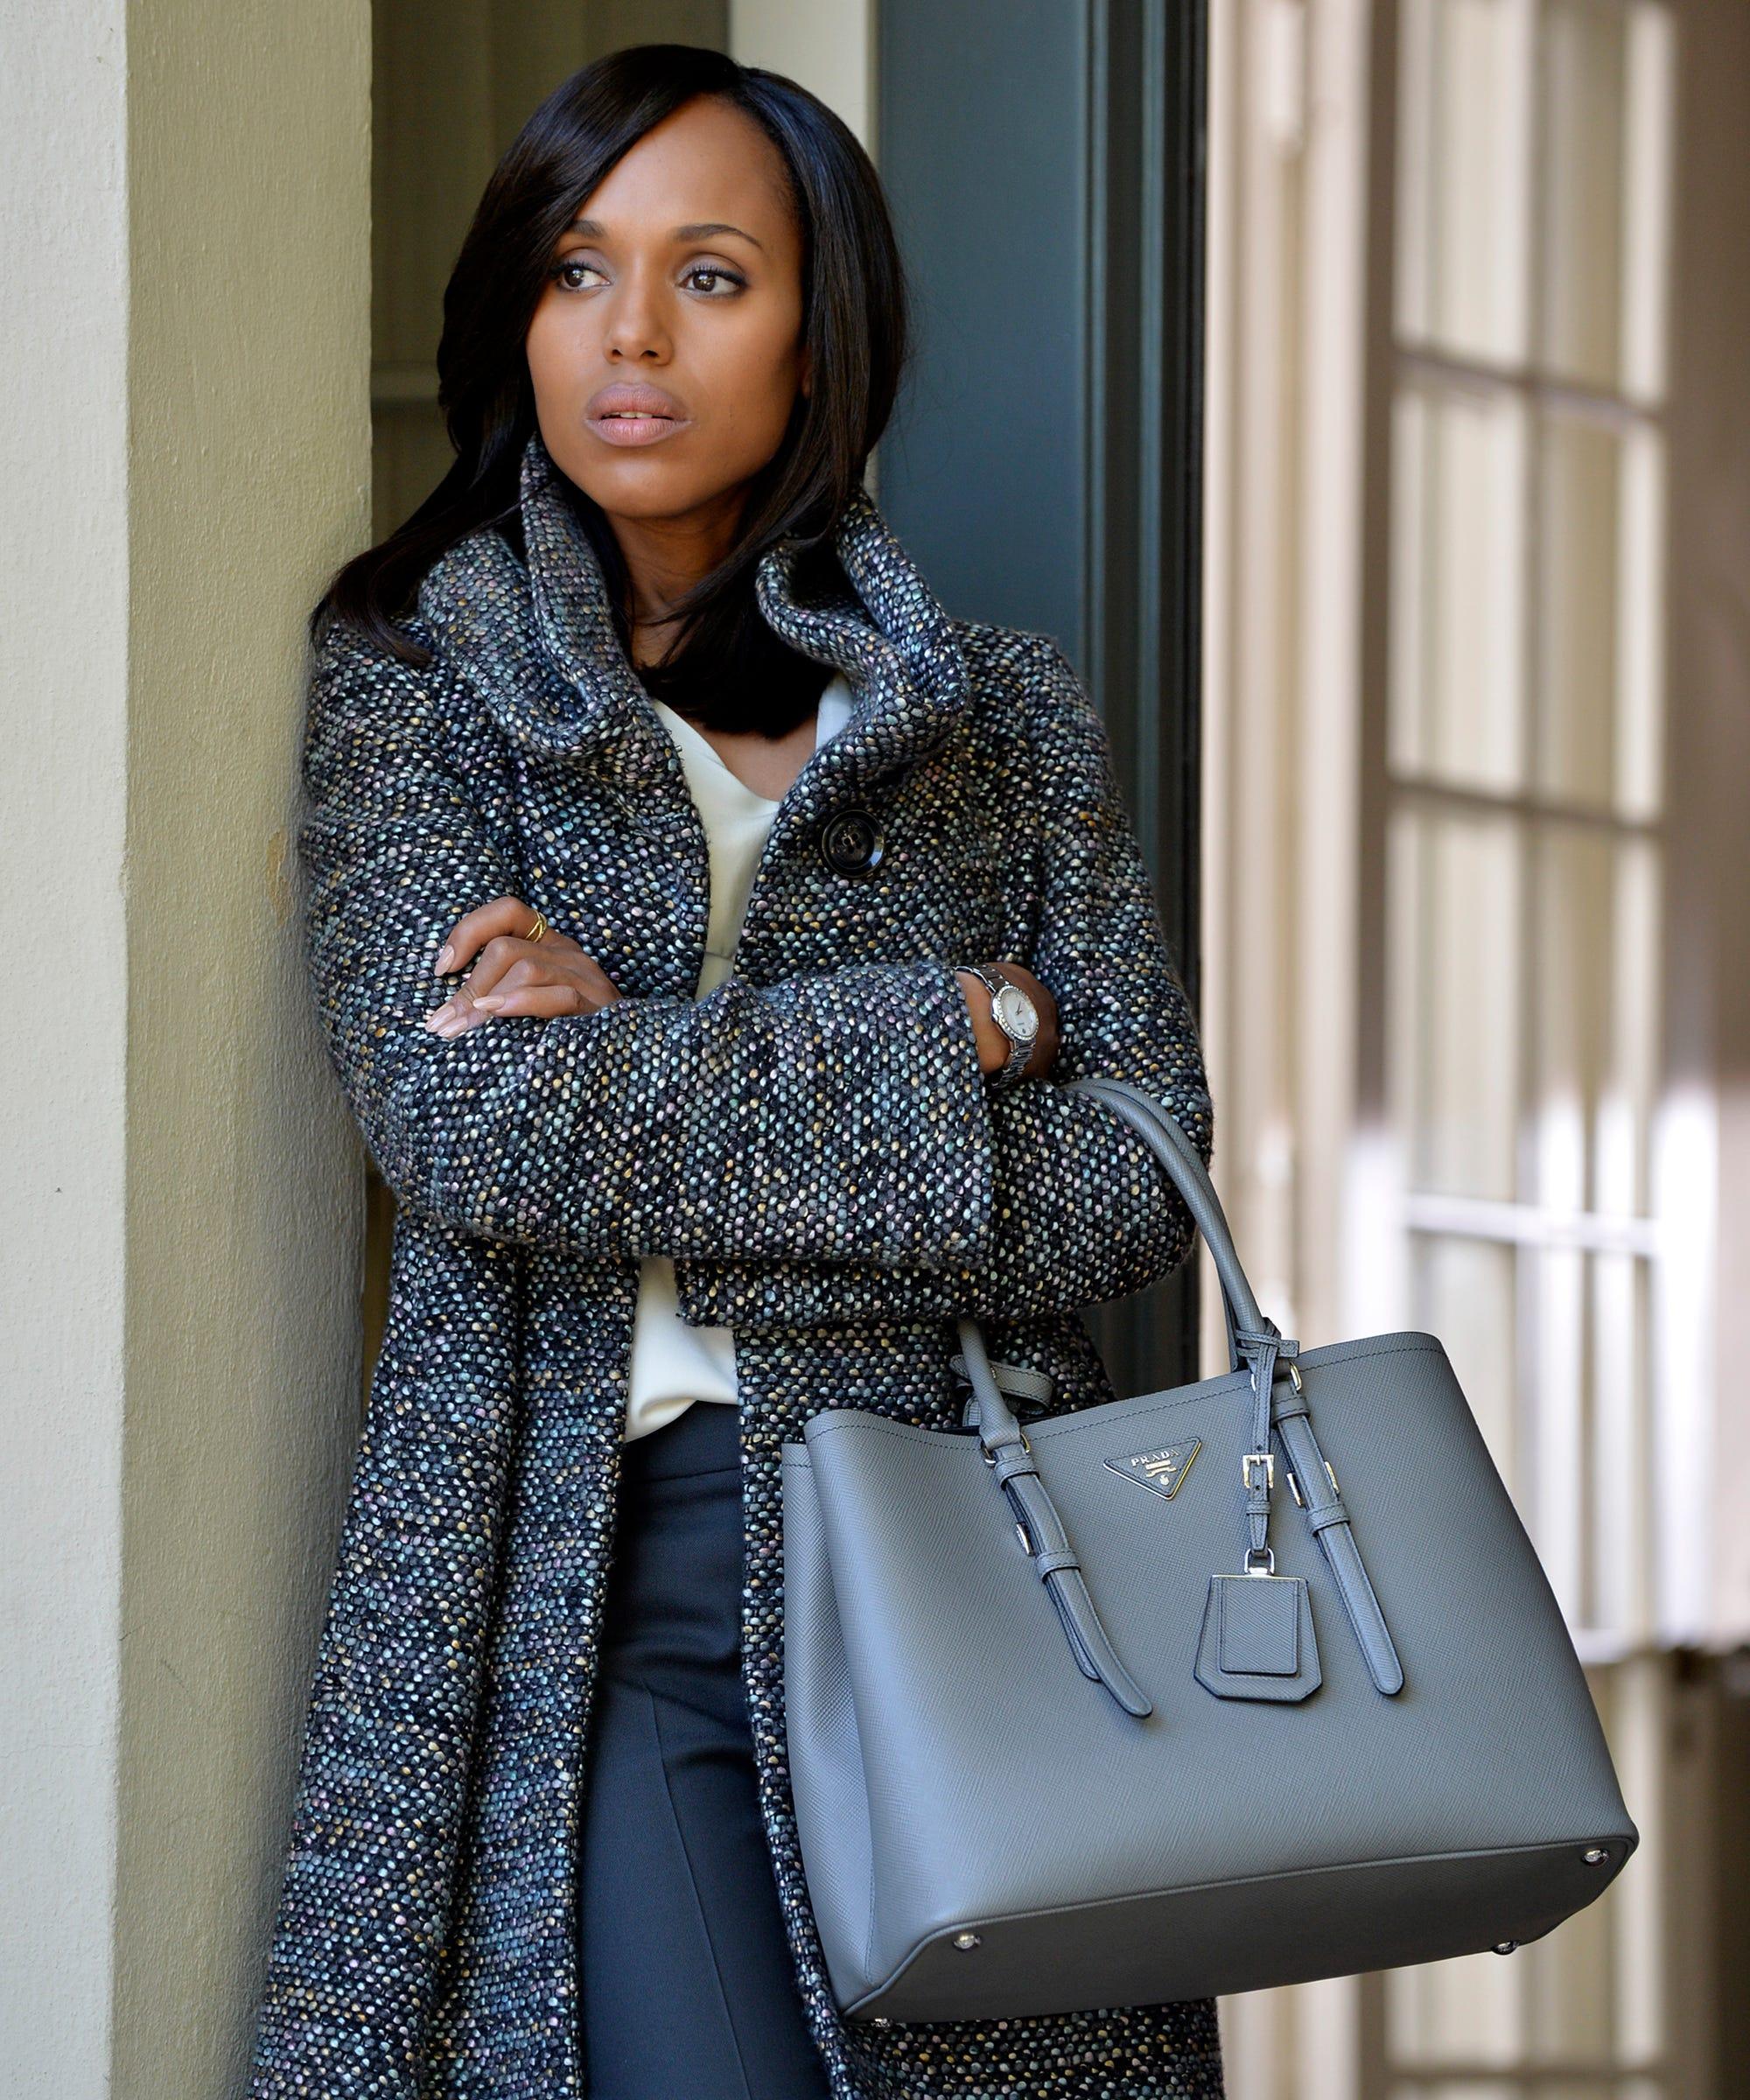 317232a5d8da Why Olivia Pope Always Has A Prada Bag On Scandal